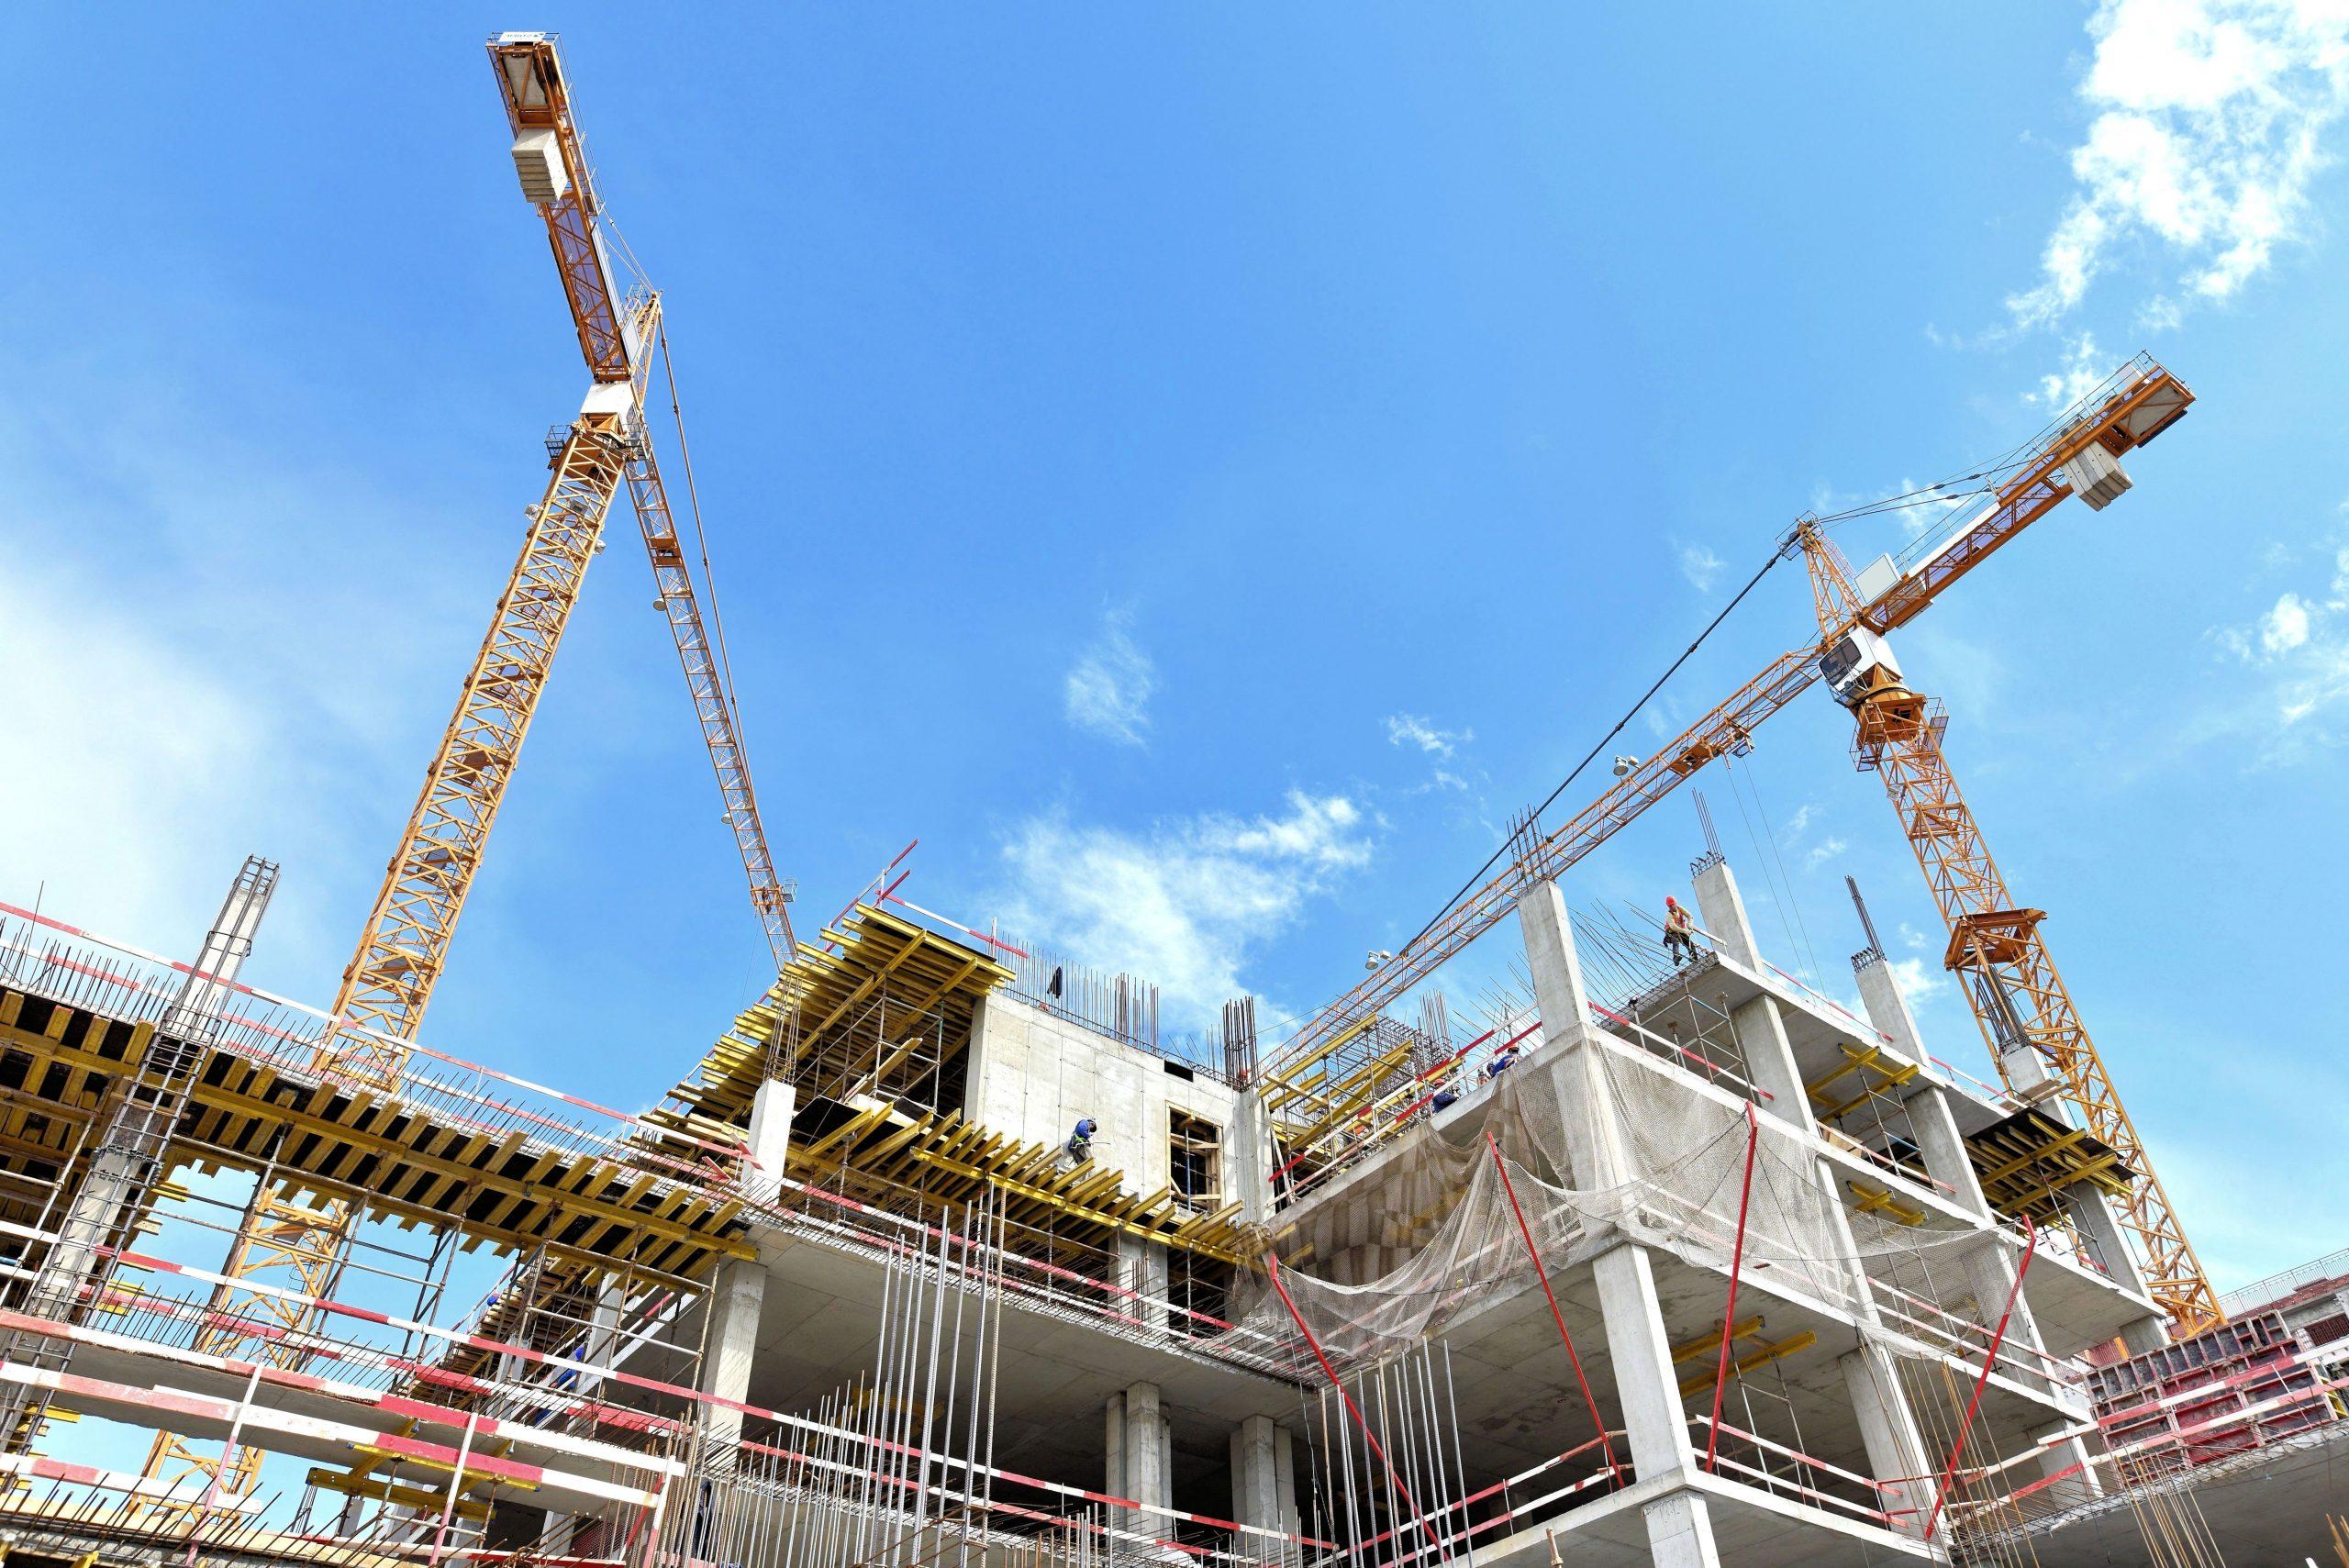 CFMEU SA and Master Builders SA call on government to work with industry to avoid shutdown